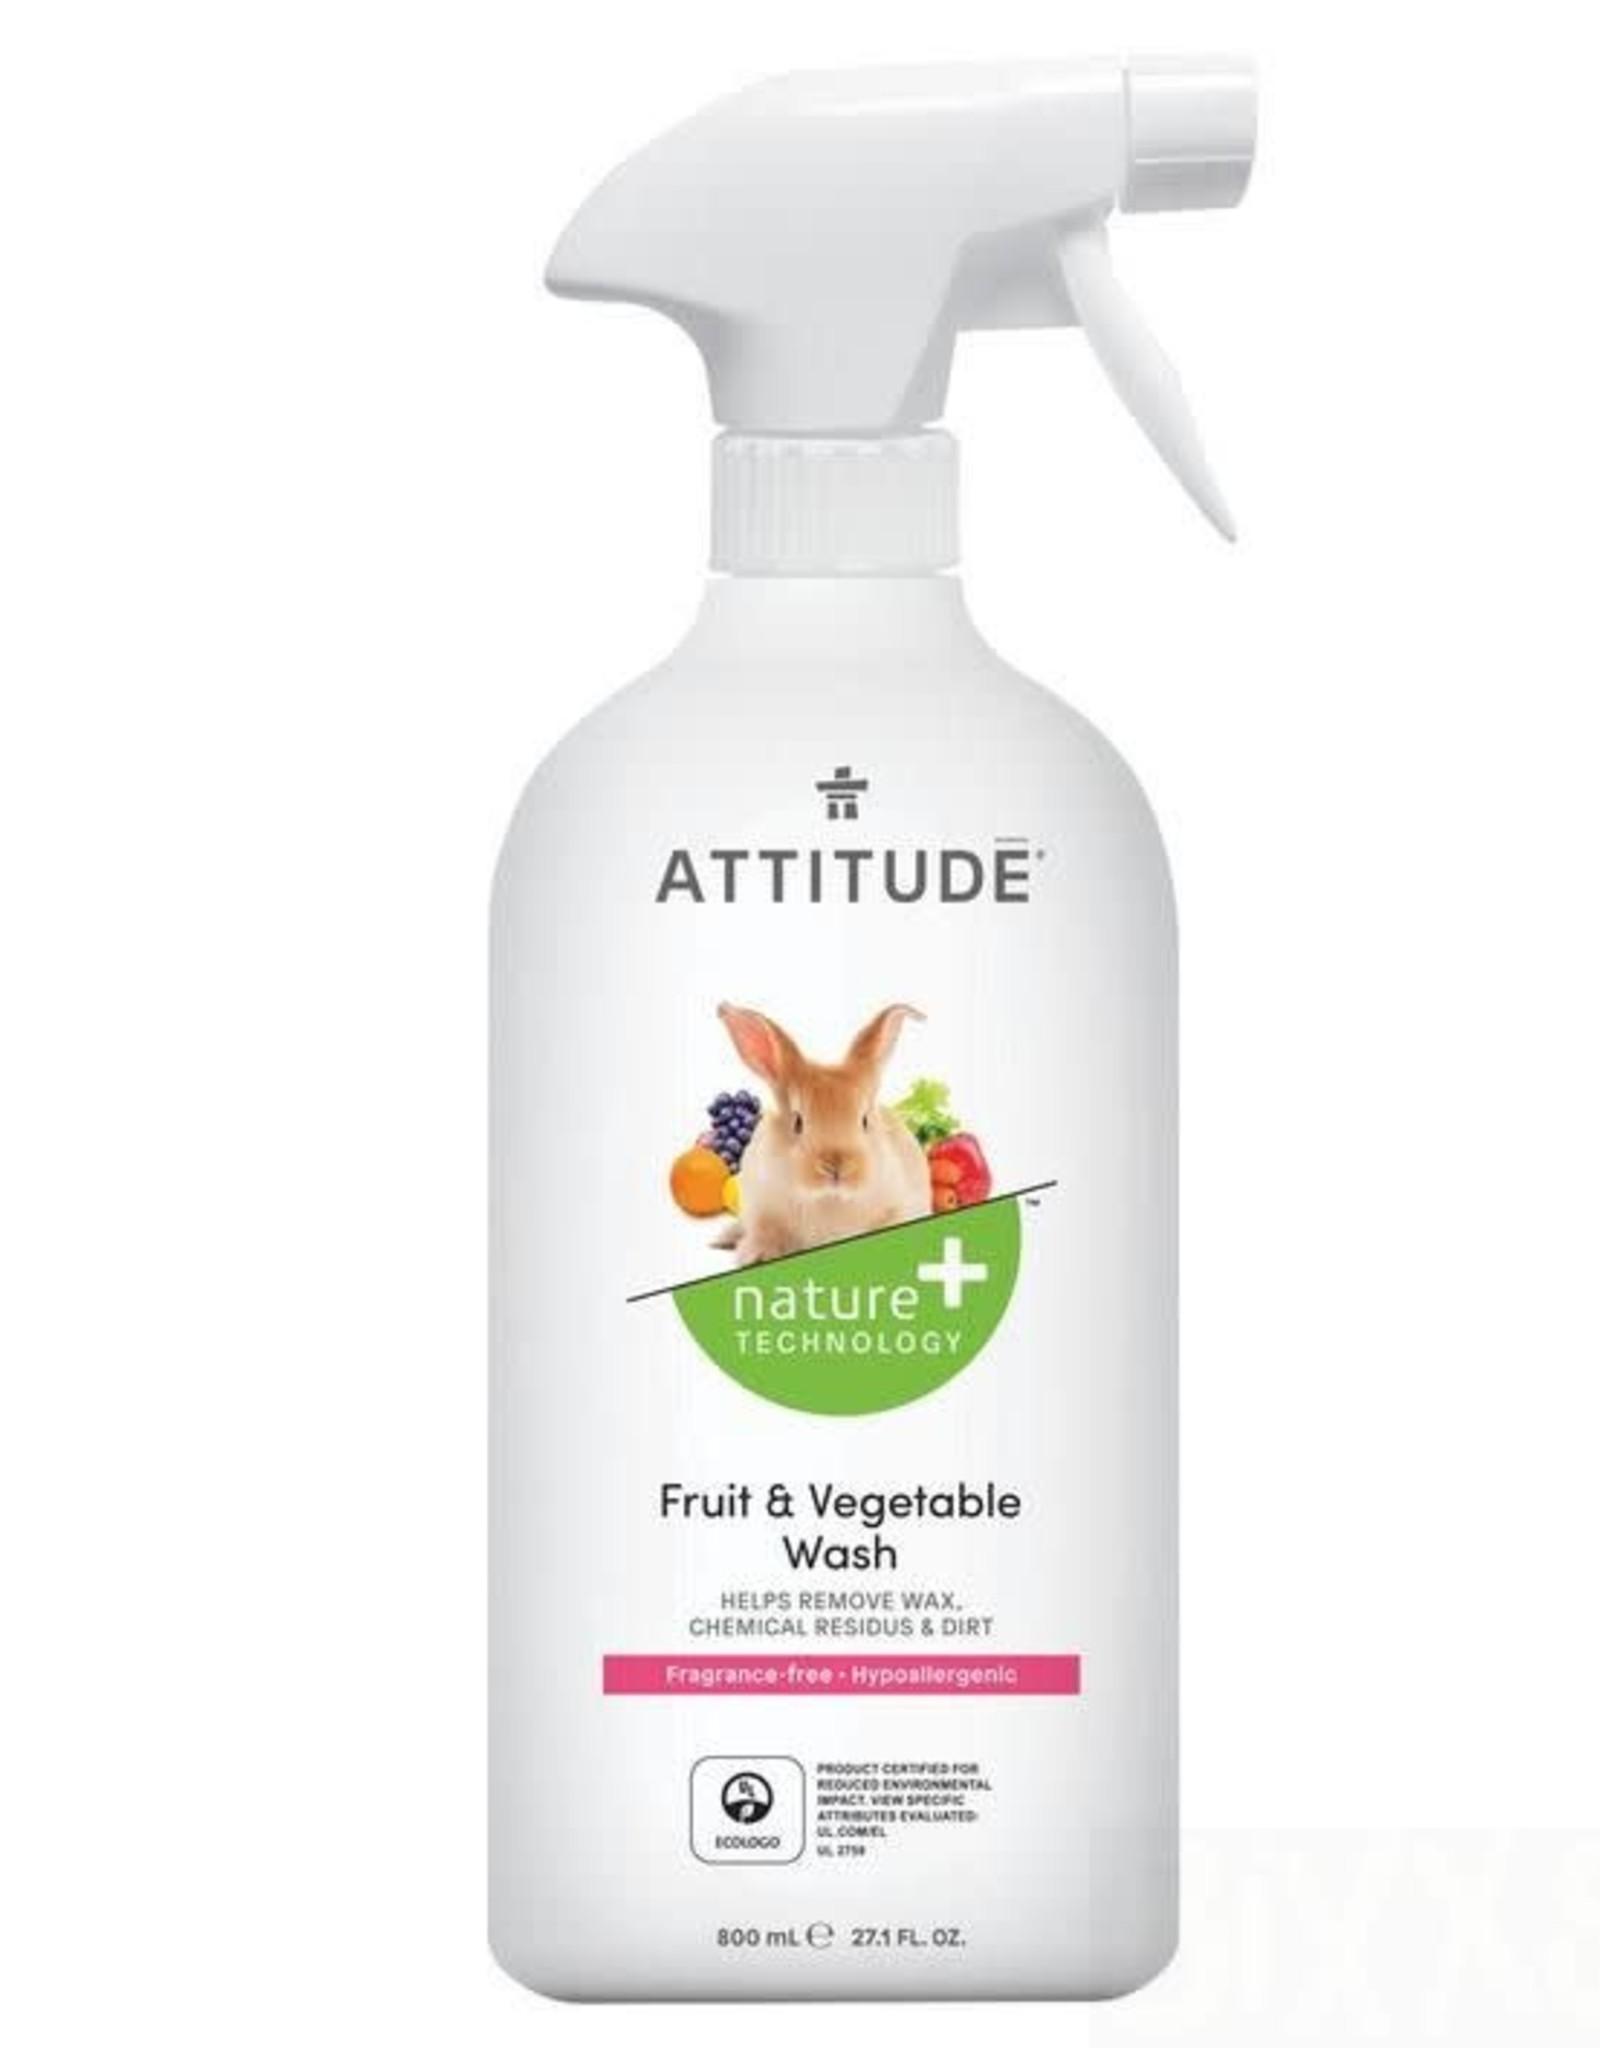 Attitude Attitude Fruit & Vegetable Wash 800ml